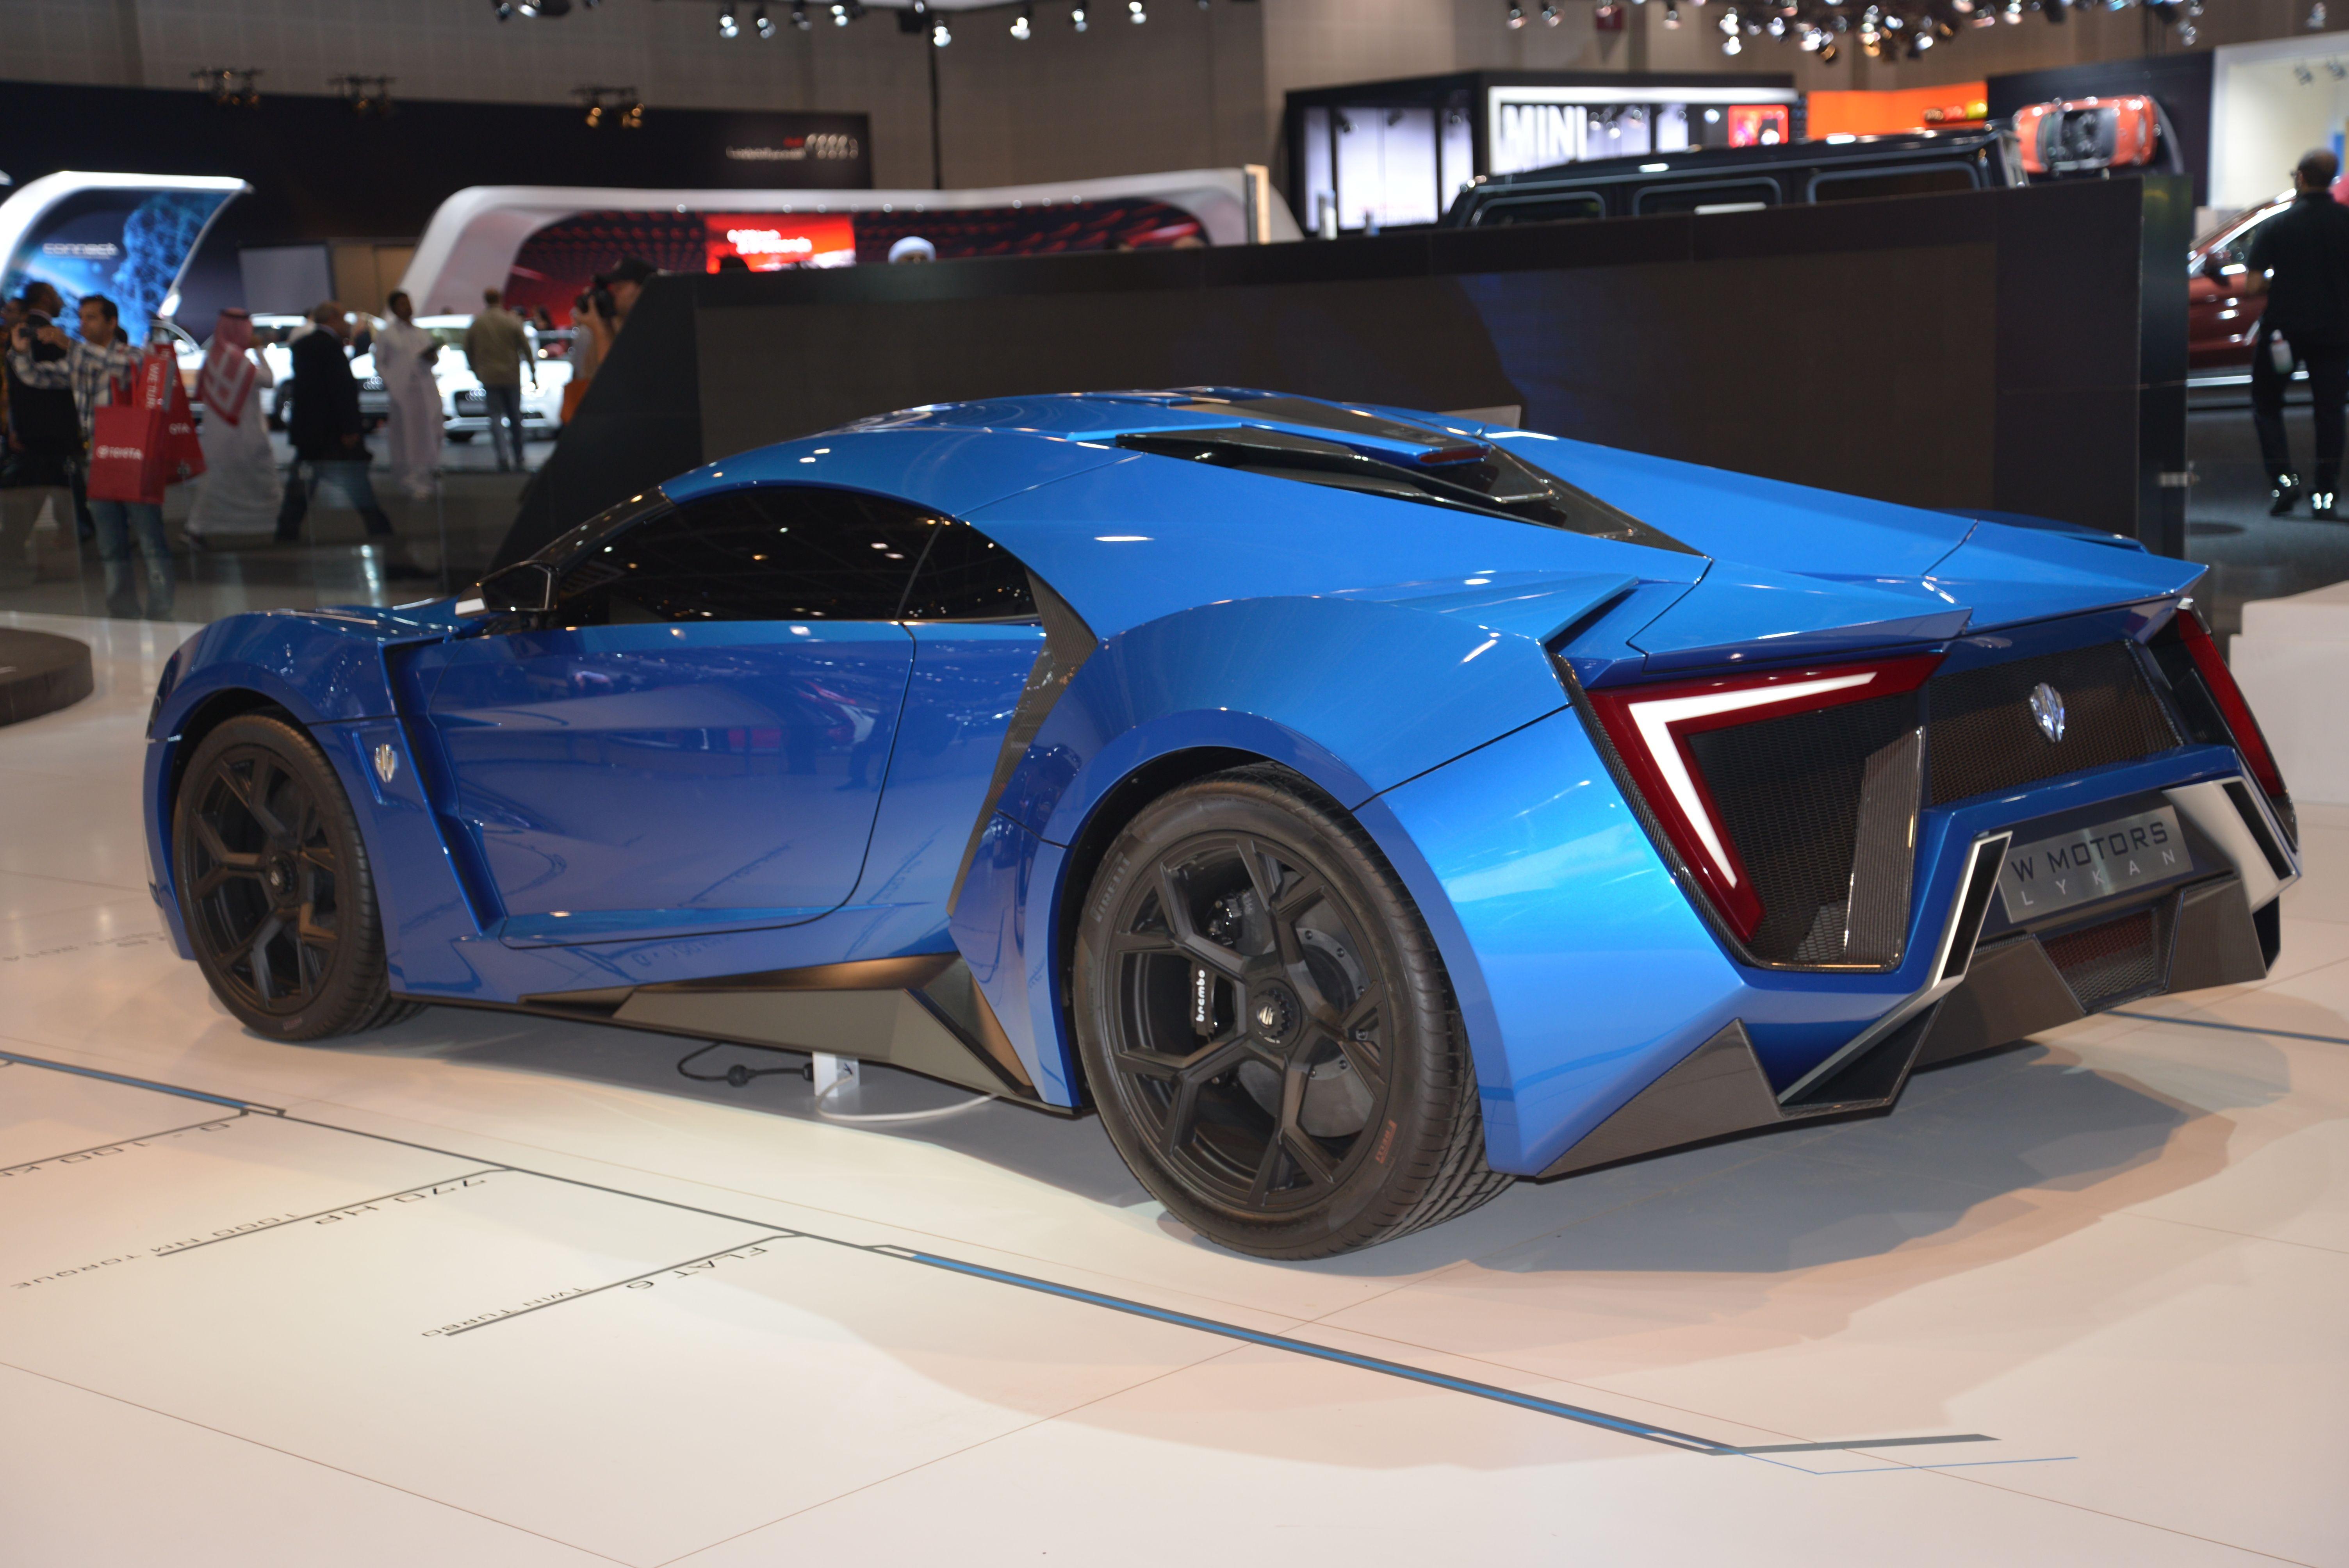 Lykan Hypersport At Dubai Motor Show 2013 Cars Supercars